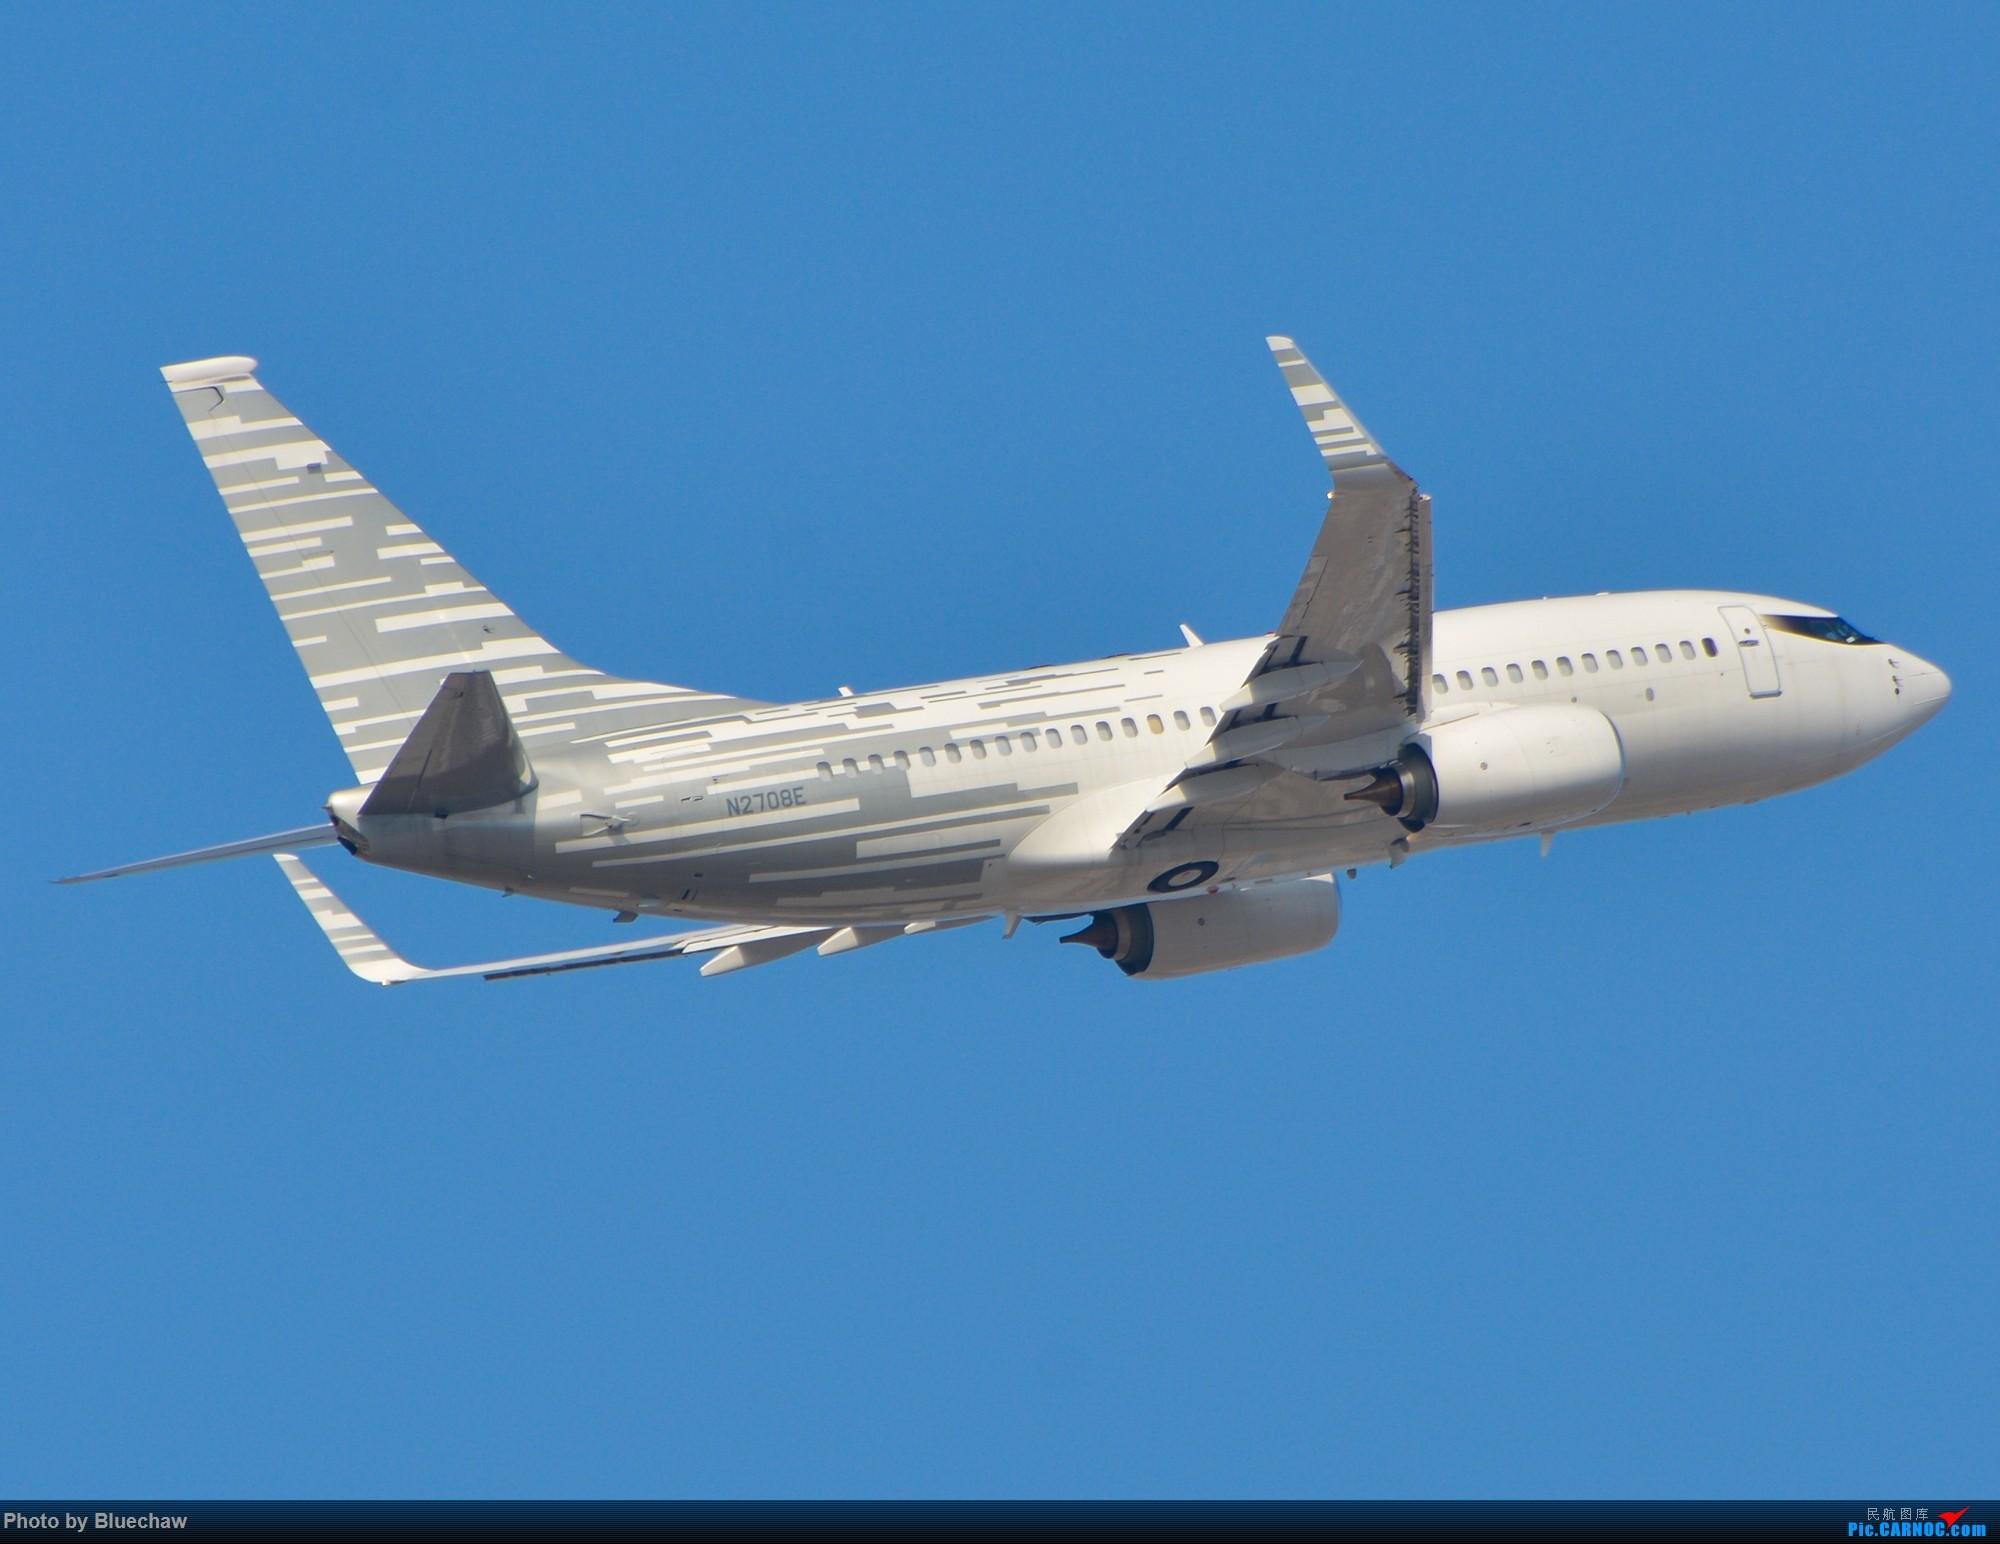 Re:[原创]二月白云拍机,酷航788等 BOEING 737-800 N2708E 中国广州白云国际机场